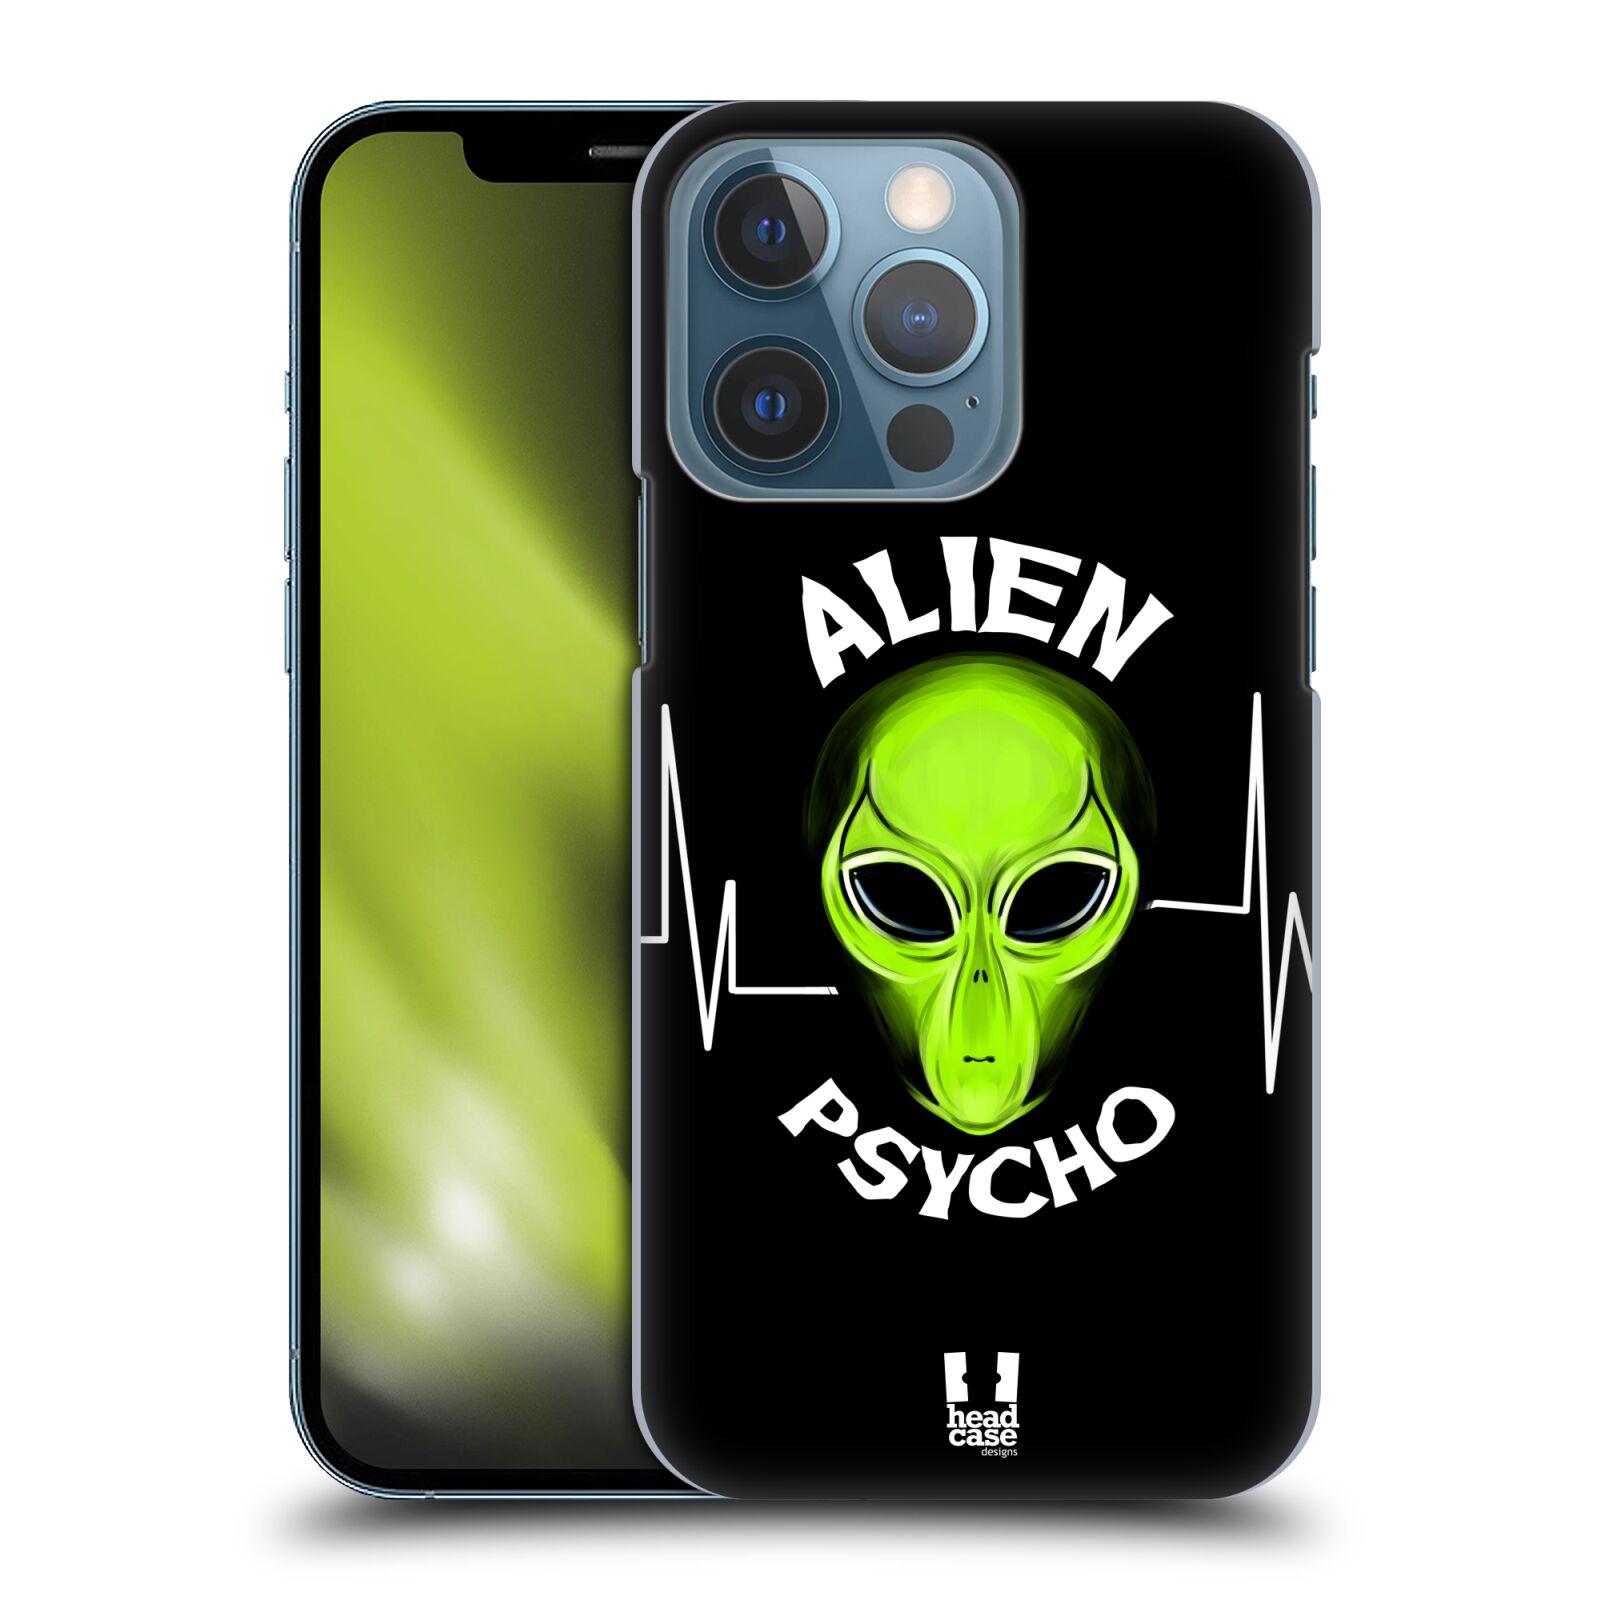 Plastové pouzdro na mobil Apple iPhone 13 Pro - Head Case - ALIENS PSYCHO